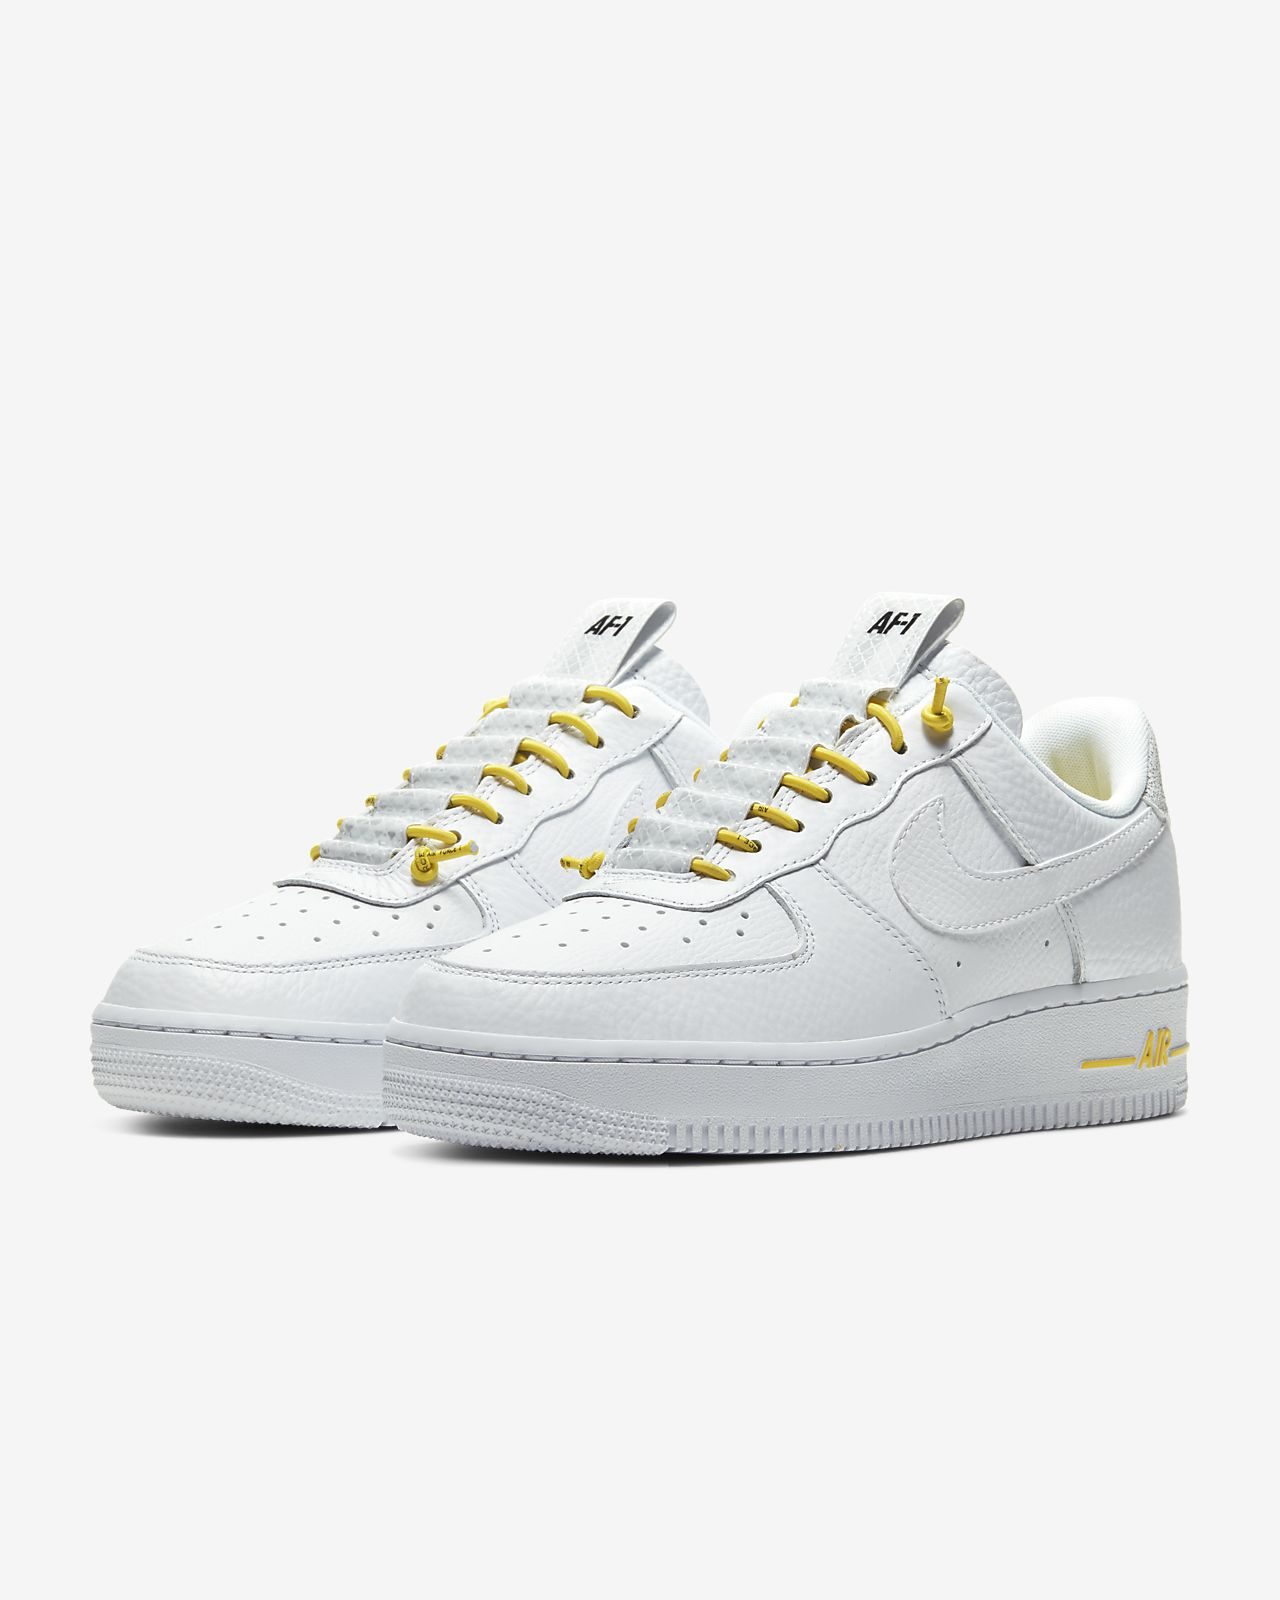 Nike Air Force 1 Sage Low Women's Shoe Nikecom   Nike Meme